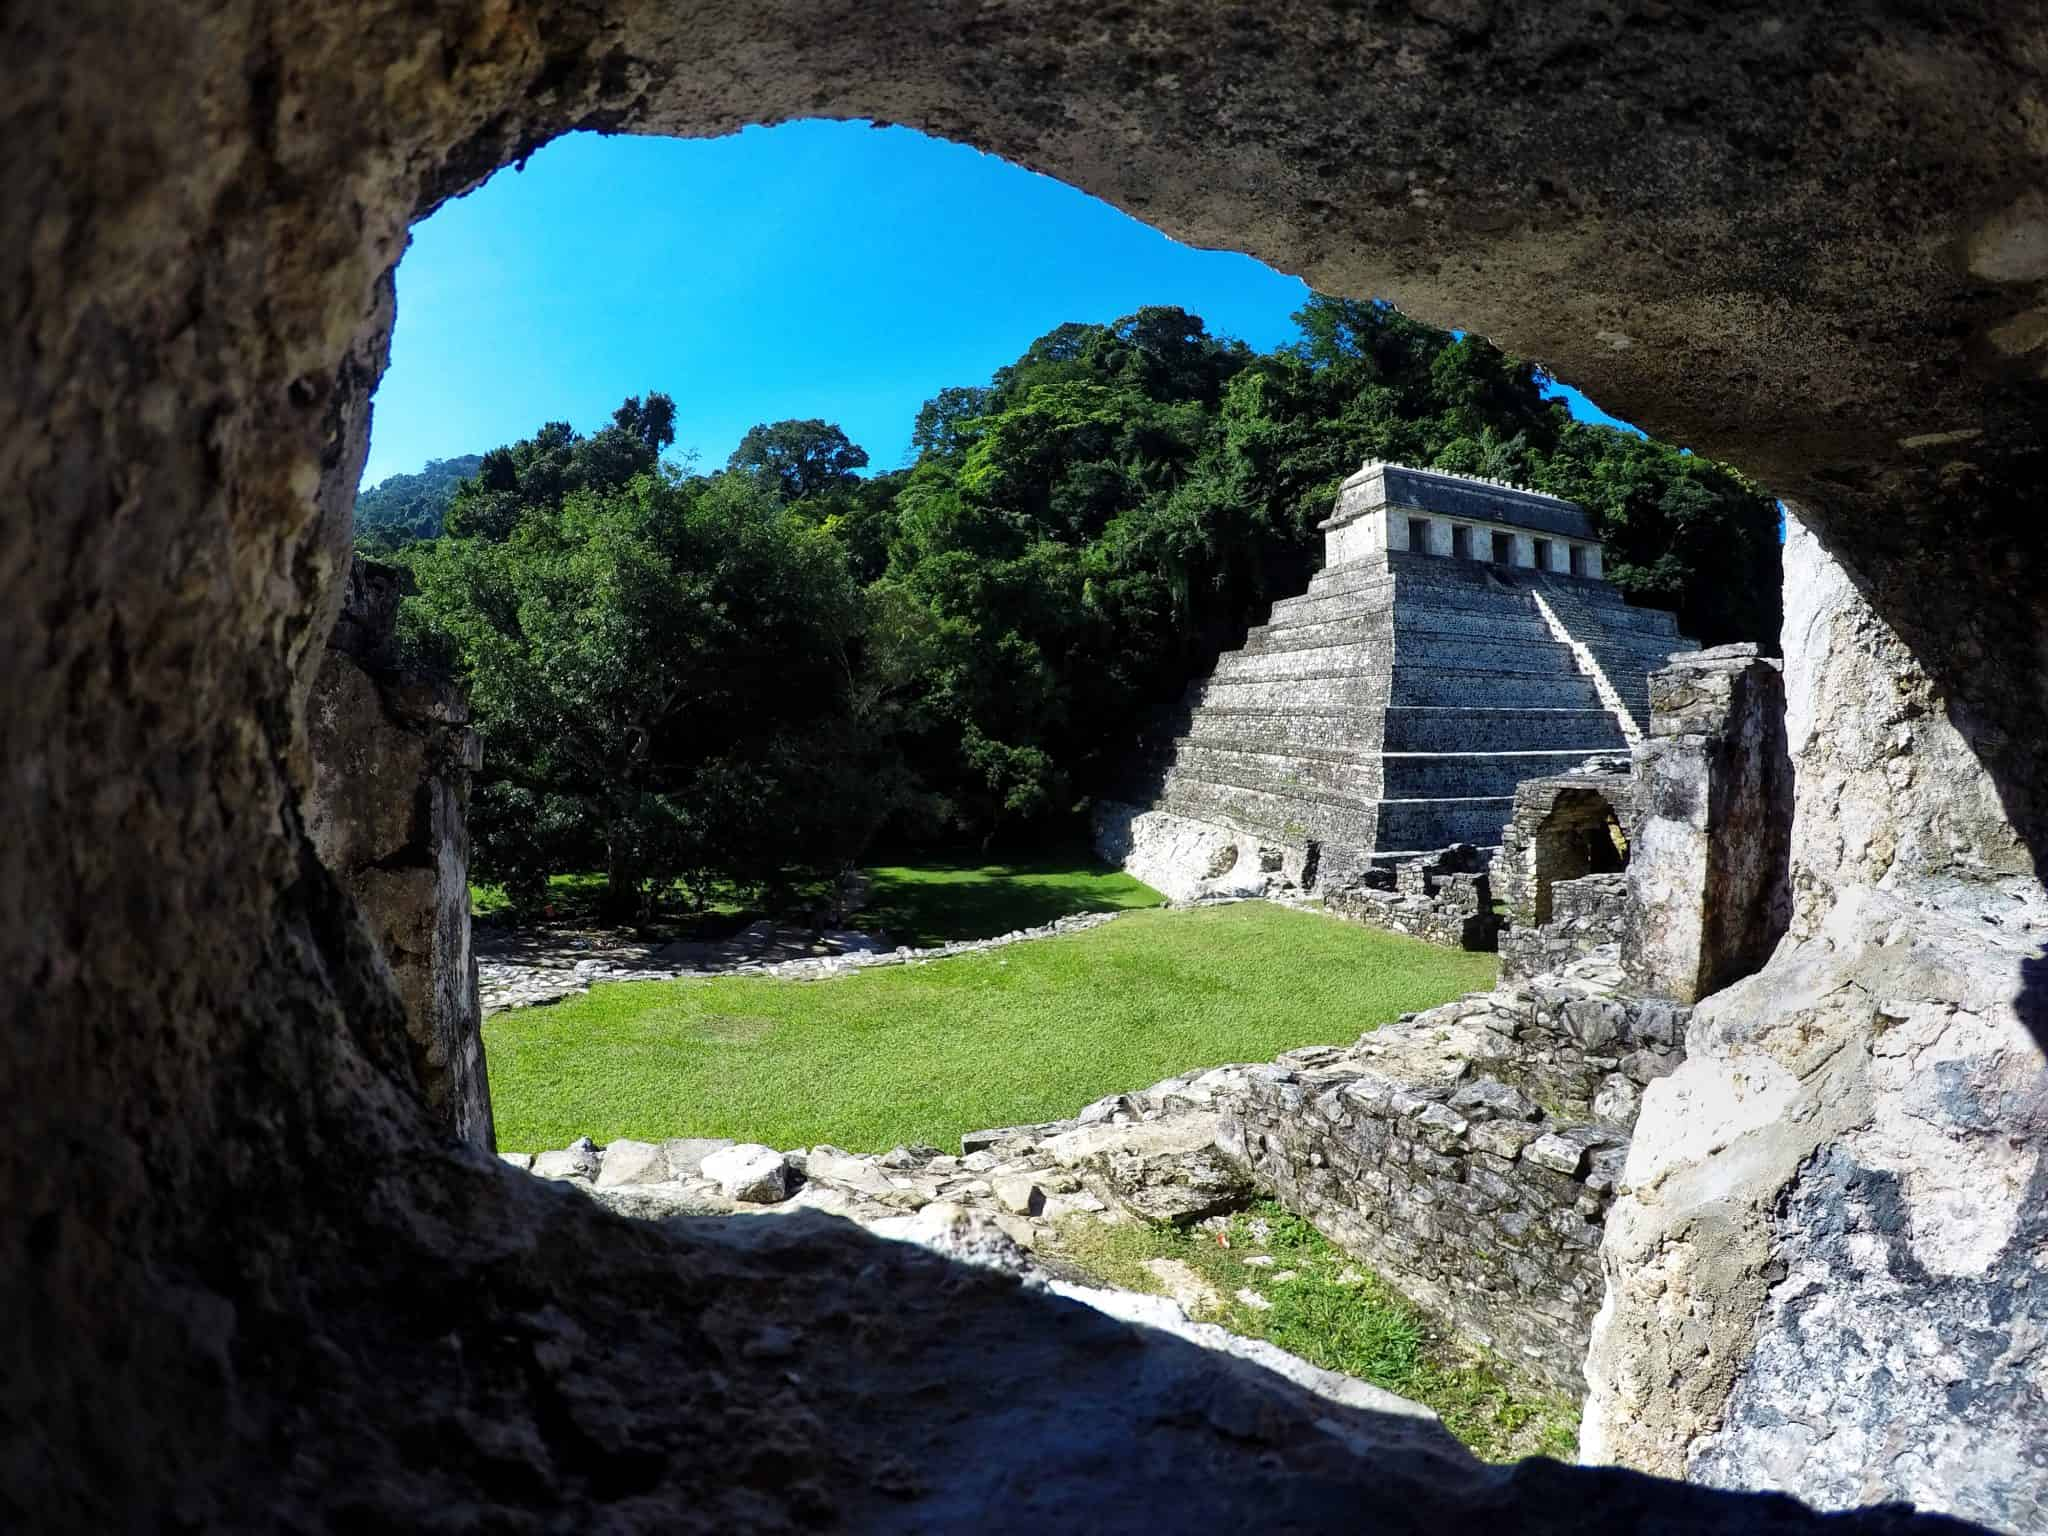 Perspectivas de Palenque